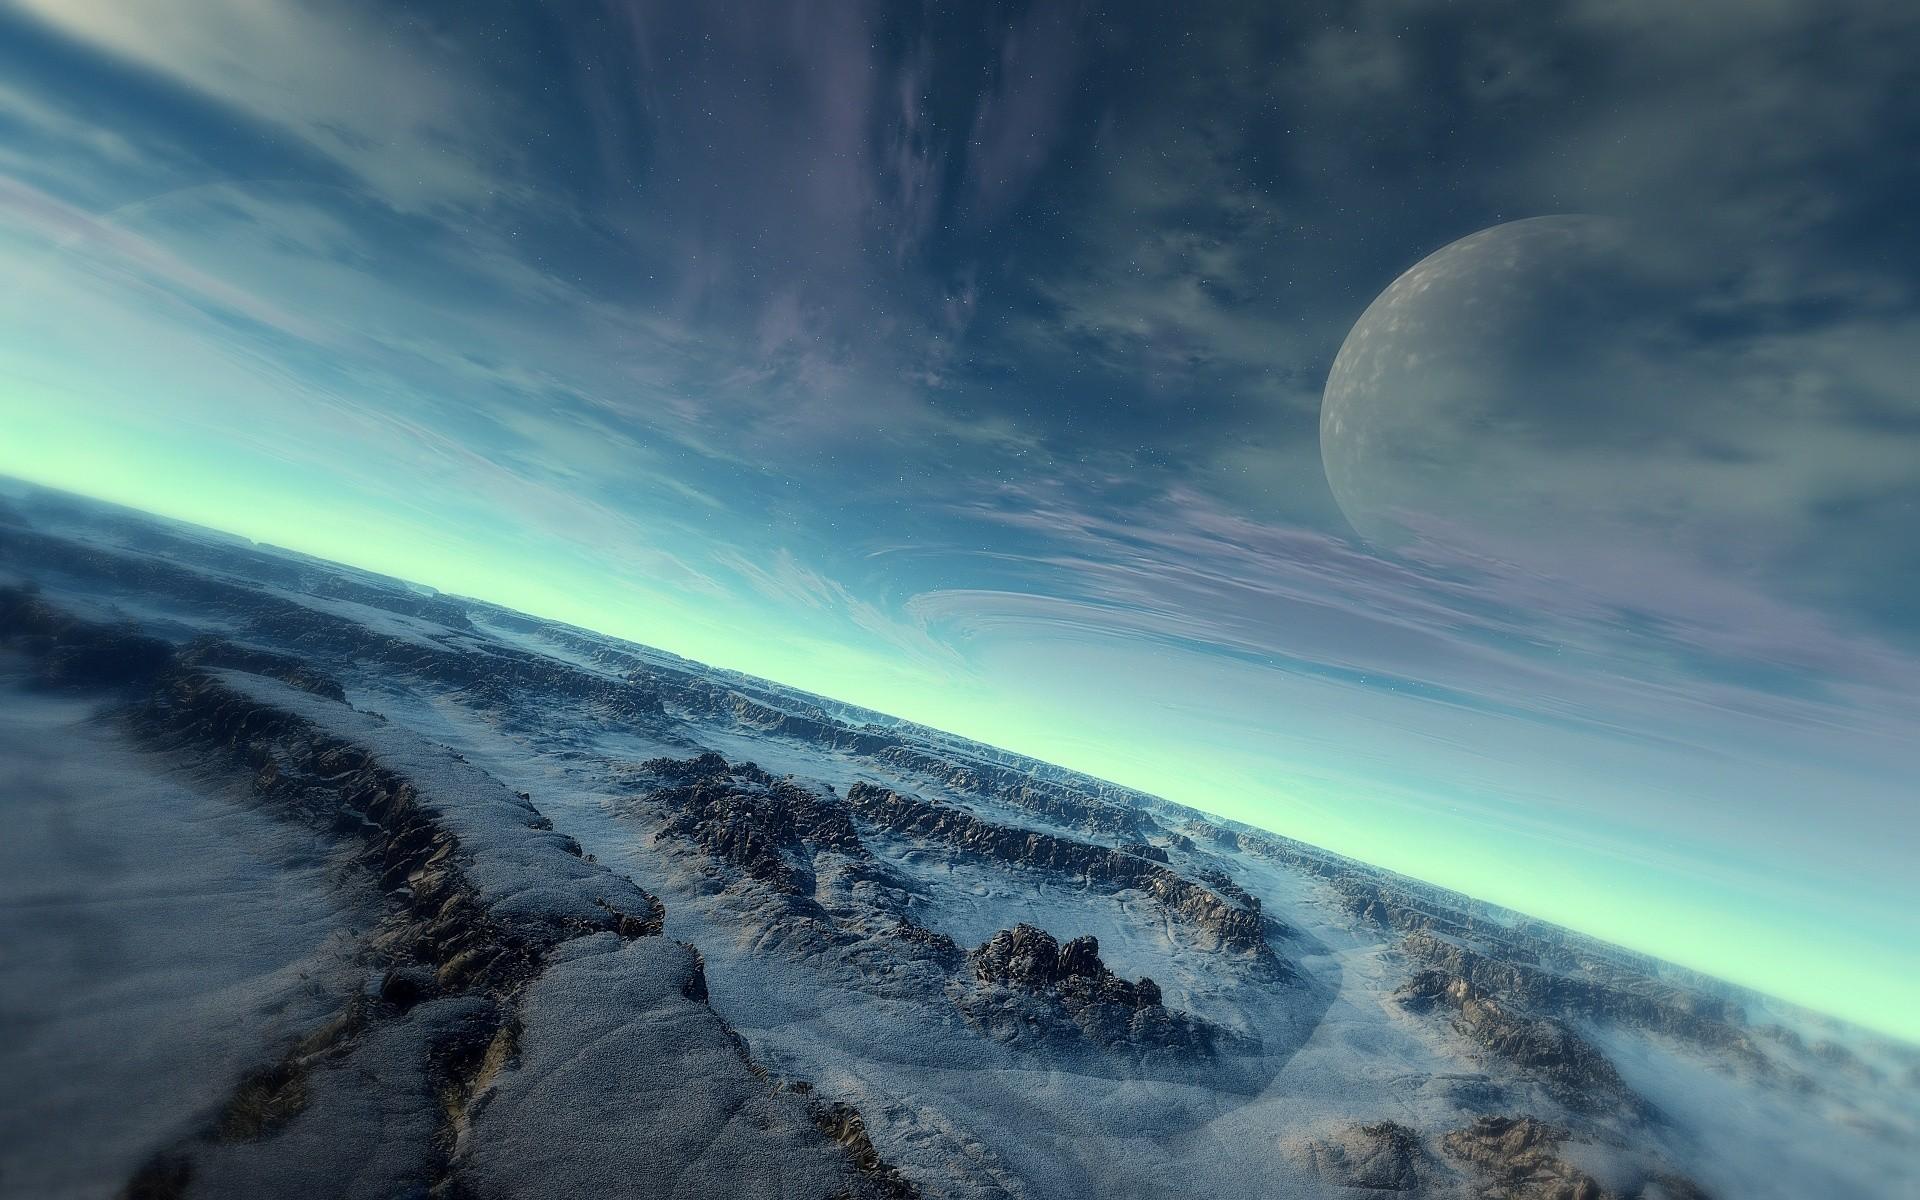 Space 3d art planet landscape moon fantasy wallpaper     147080    WallpaperUP